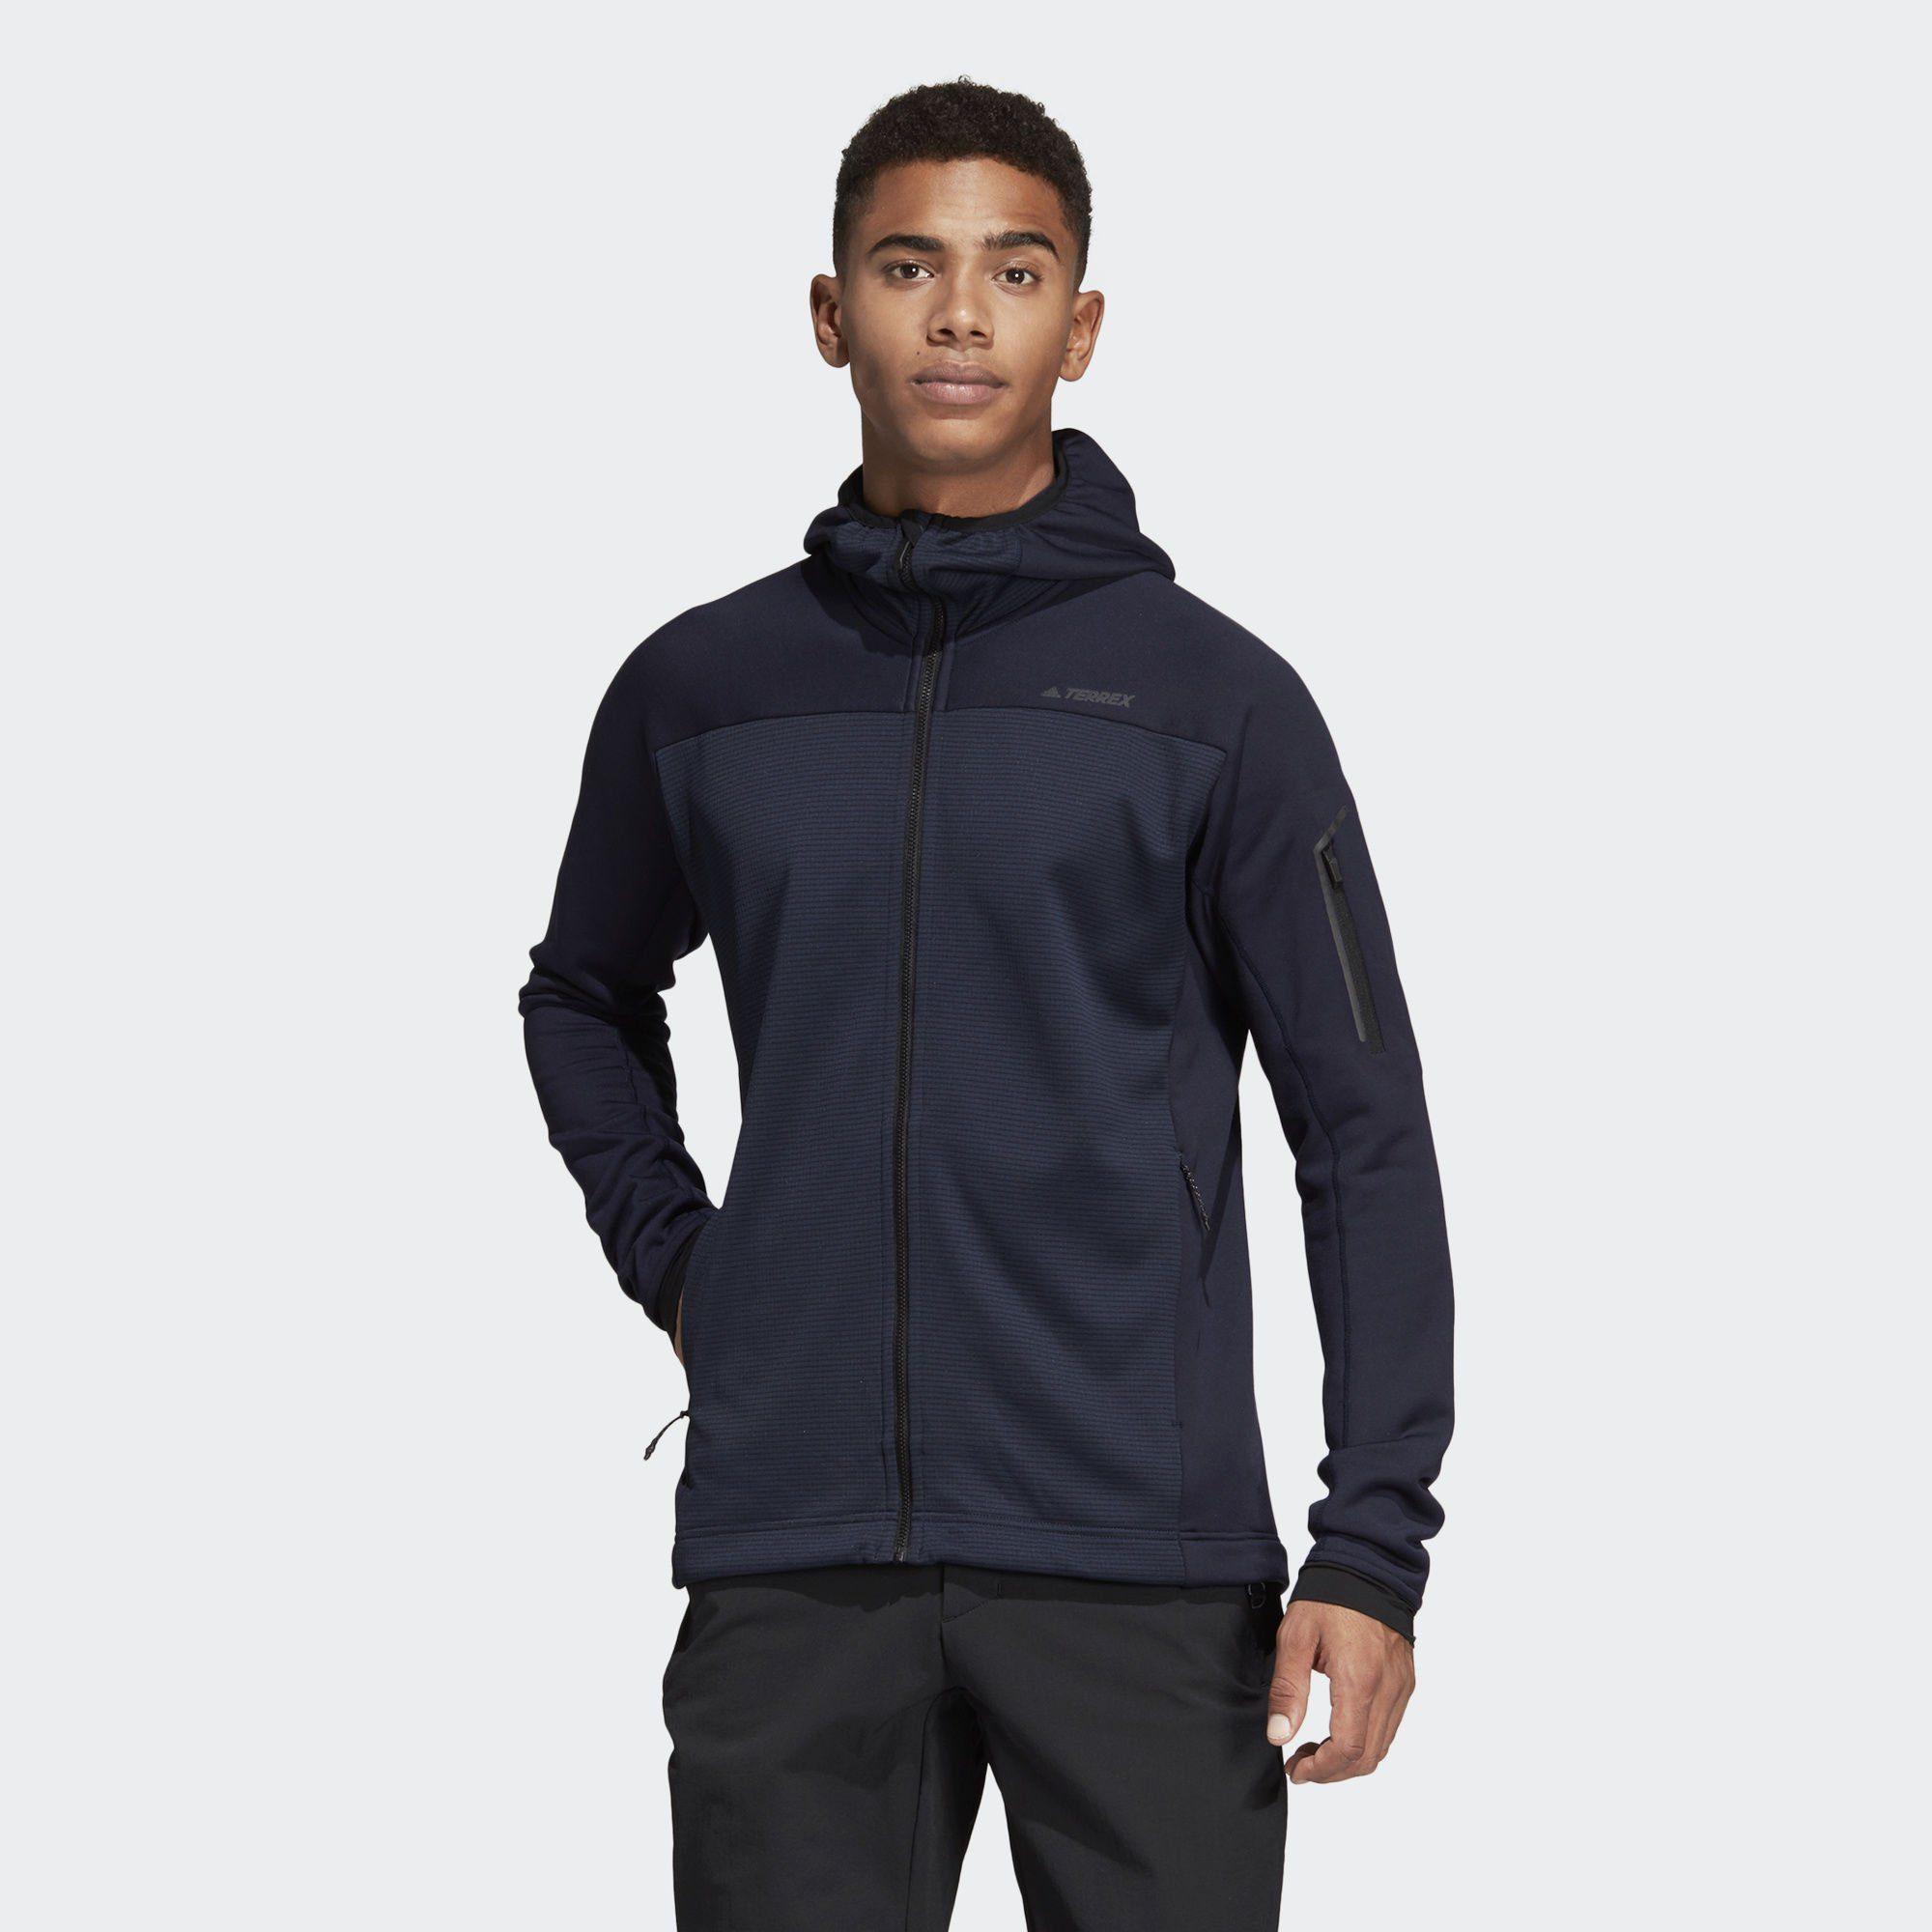 adidas Performance Funktions Kapuzensweatjacke »Stockhorn Hooded Jacke« online kaufen   OTTO